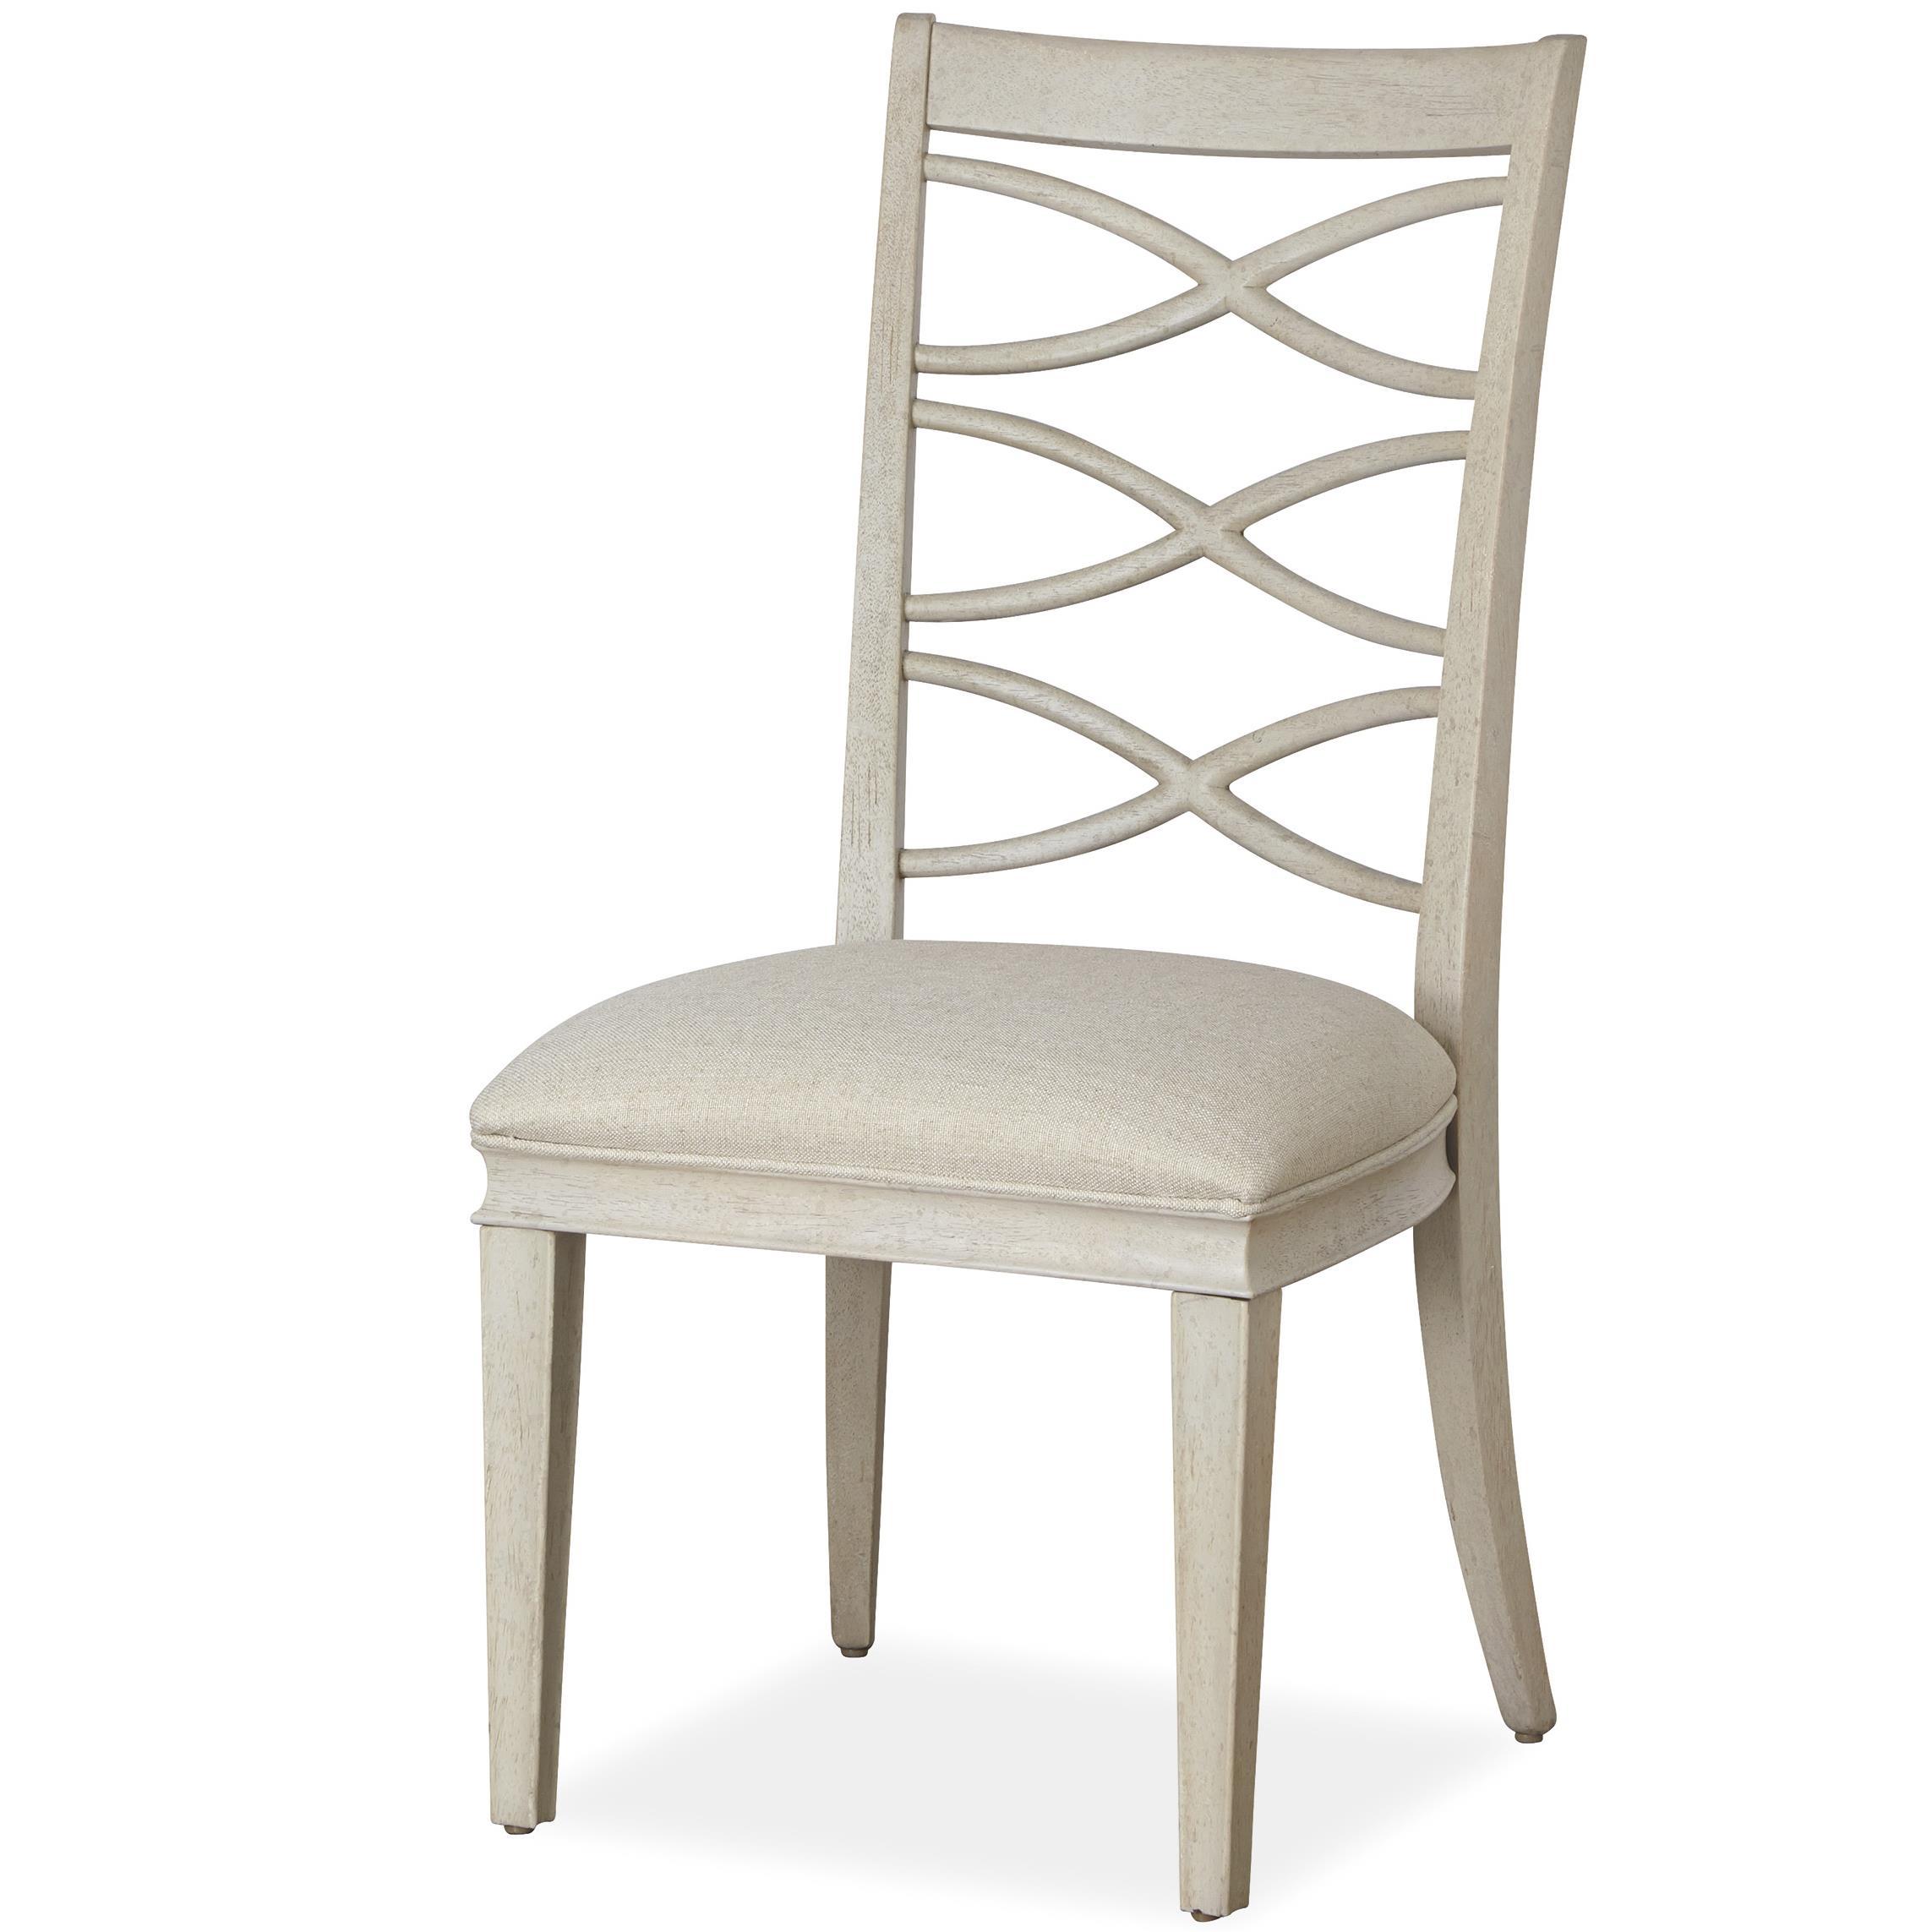 Universal California - Malibu X-Back Side Chair - Item Number: 476634-RTA